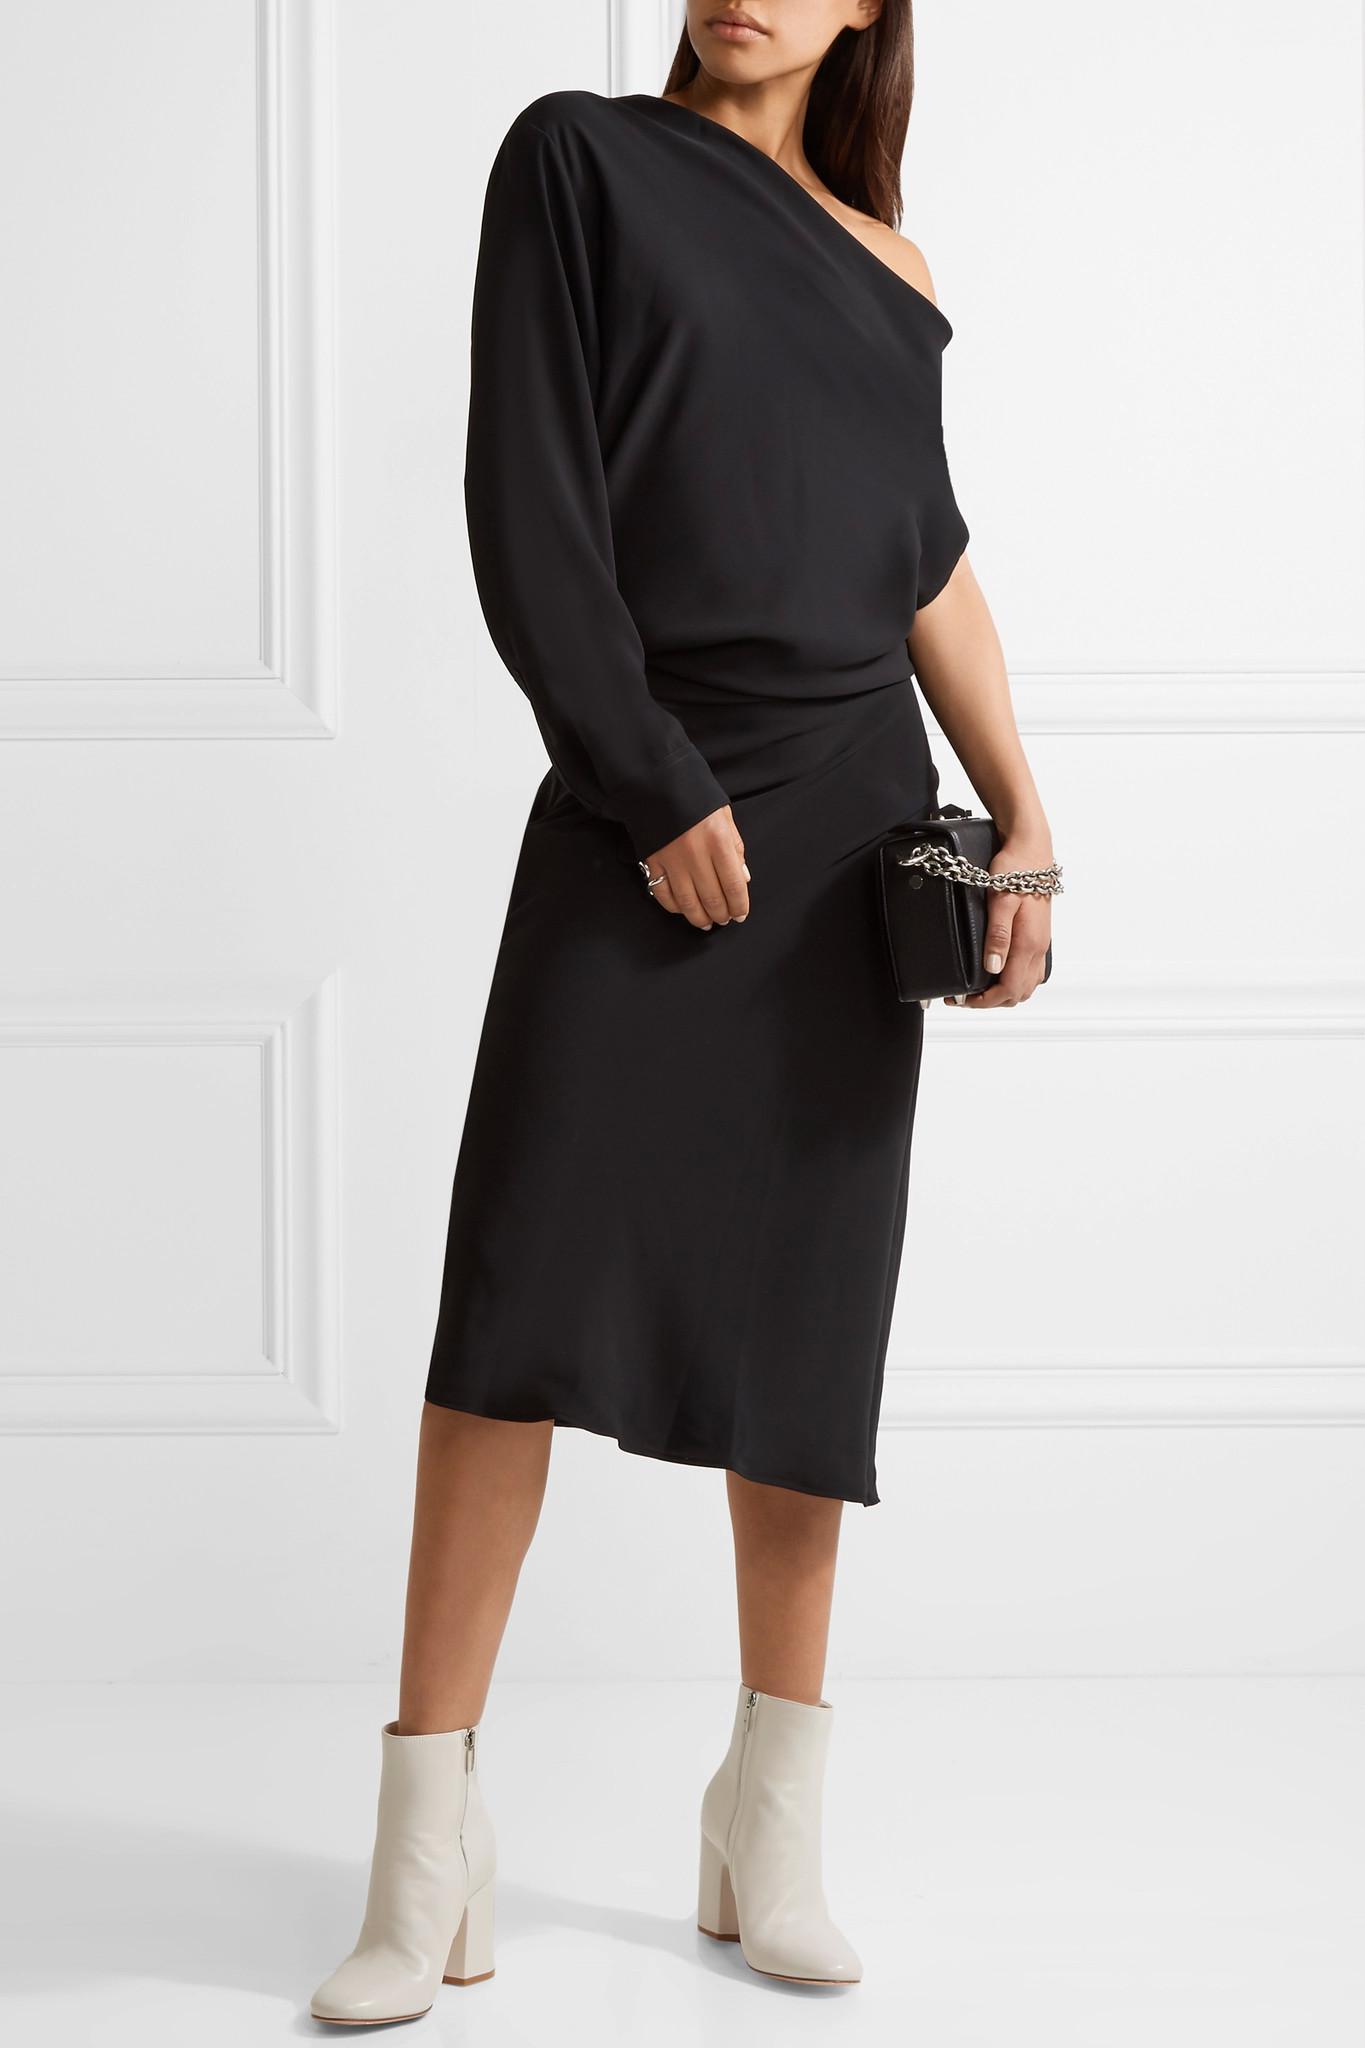 One-shoulder Crepe De Chine Midi Dress - Black Maison Martin Margiela OQO8q